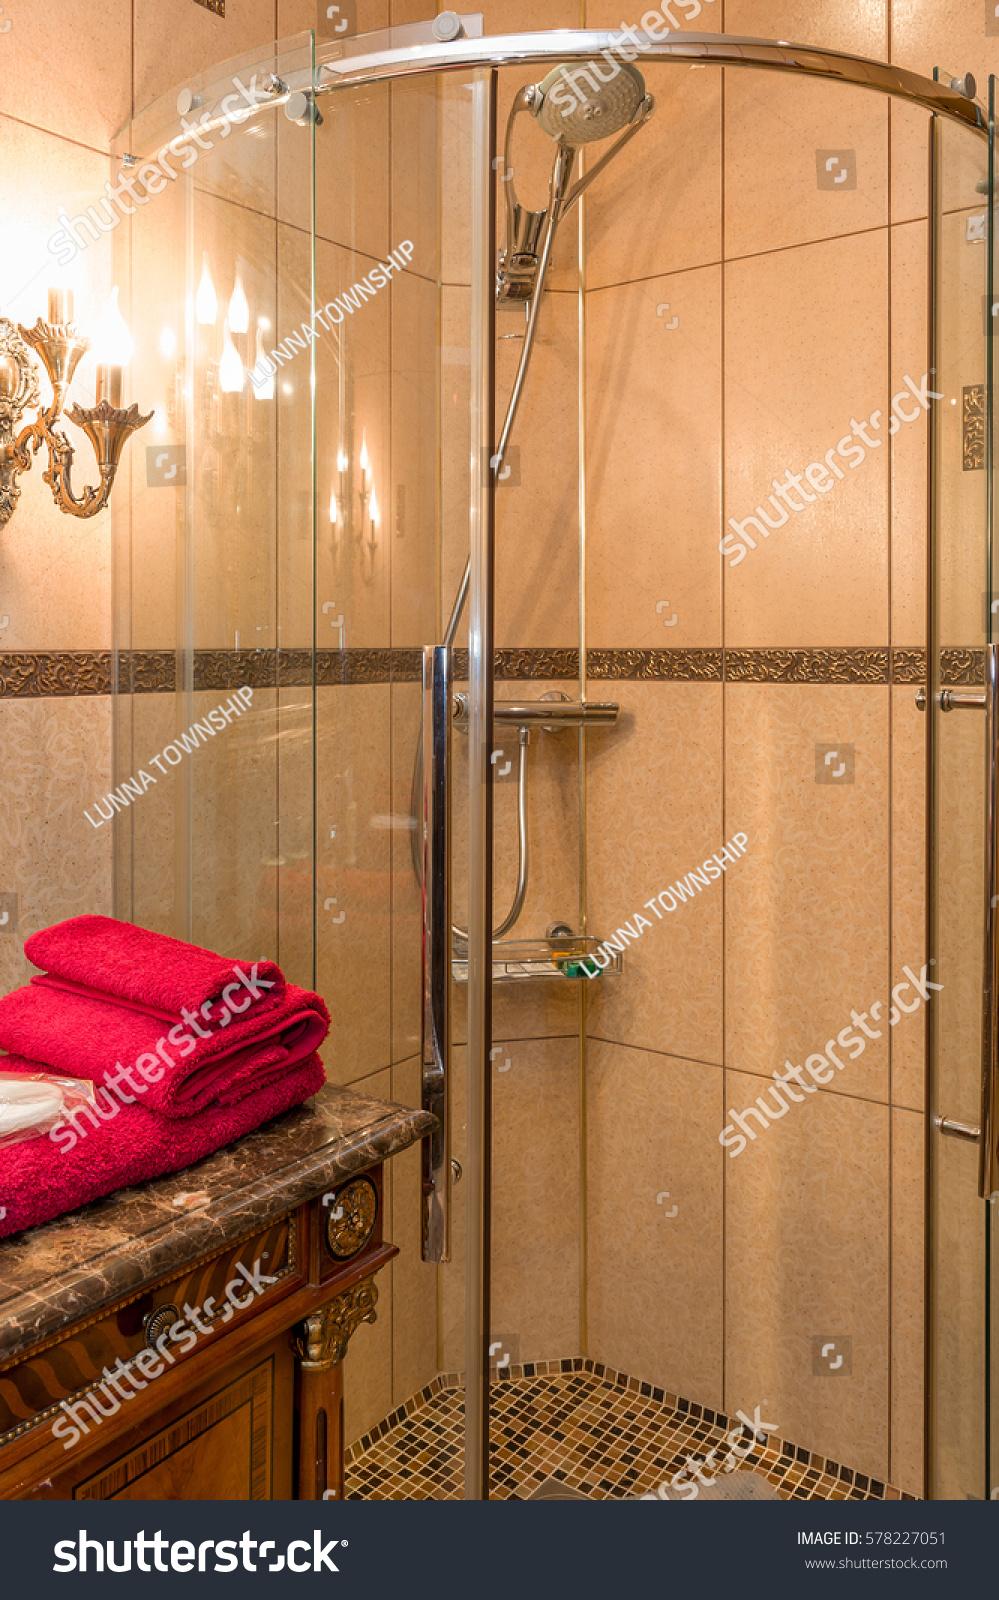 Moscow russian federation circa february 2017 stock photo 578227051 moscow russian federation circa february 2017 hotel interior bathroom shower dailygadgetfo Images